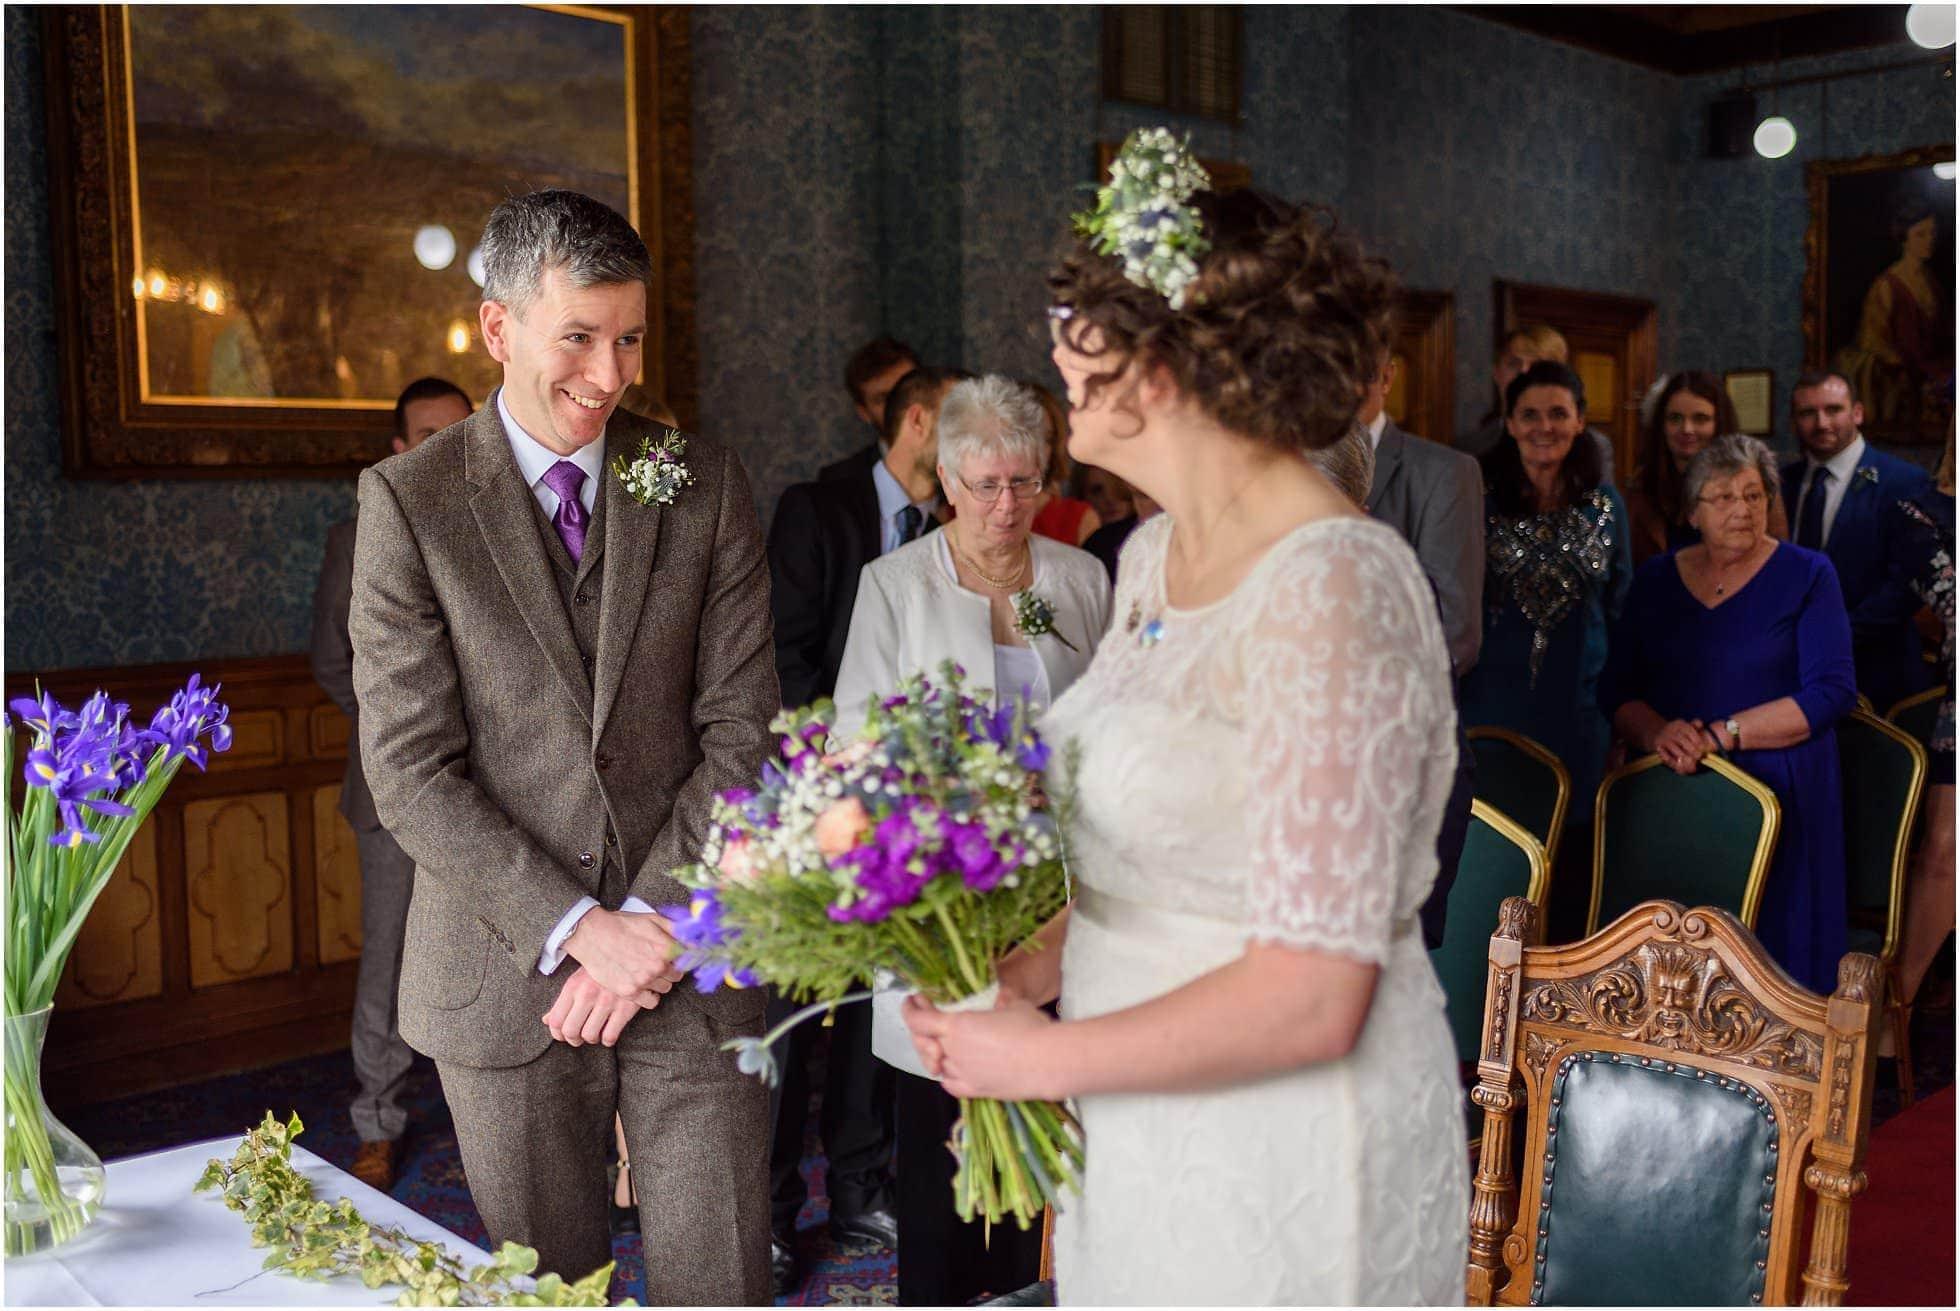 Groom blown away by stunning bride